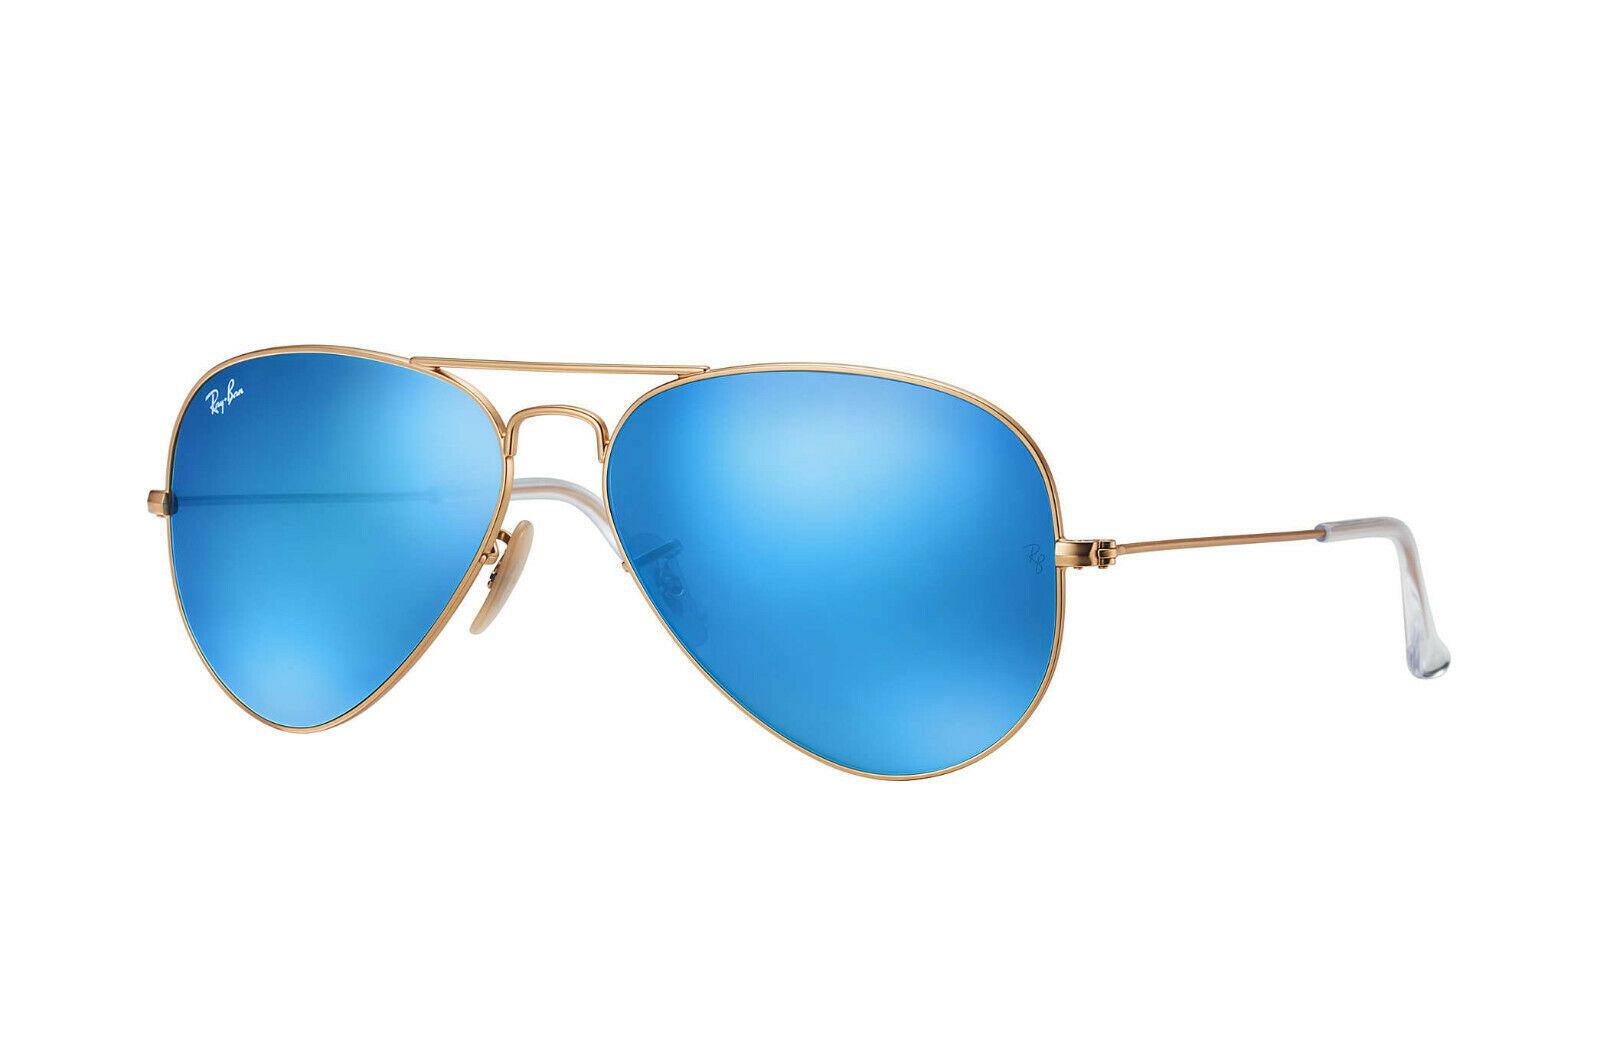 e5dd62daea7d3 New Ray Ban Aviator Sunglasses RB 3025 and 50 similar items. 57